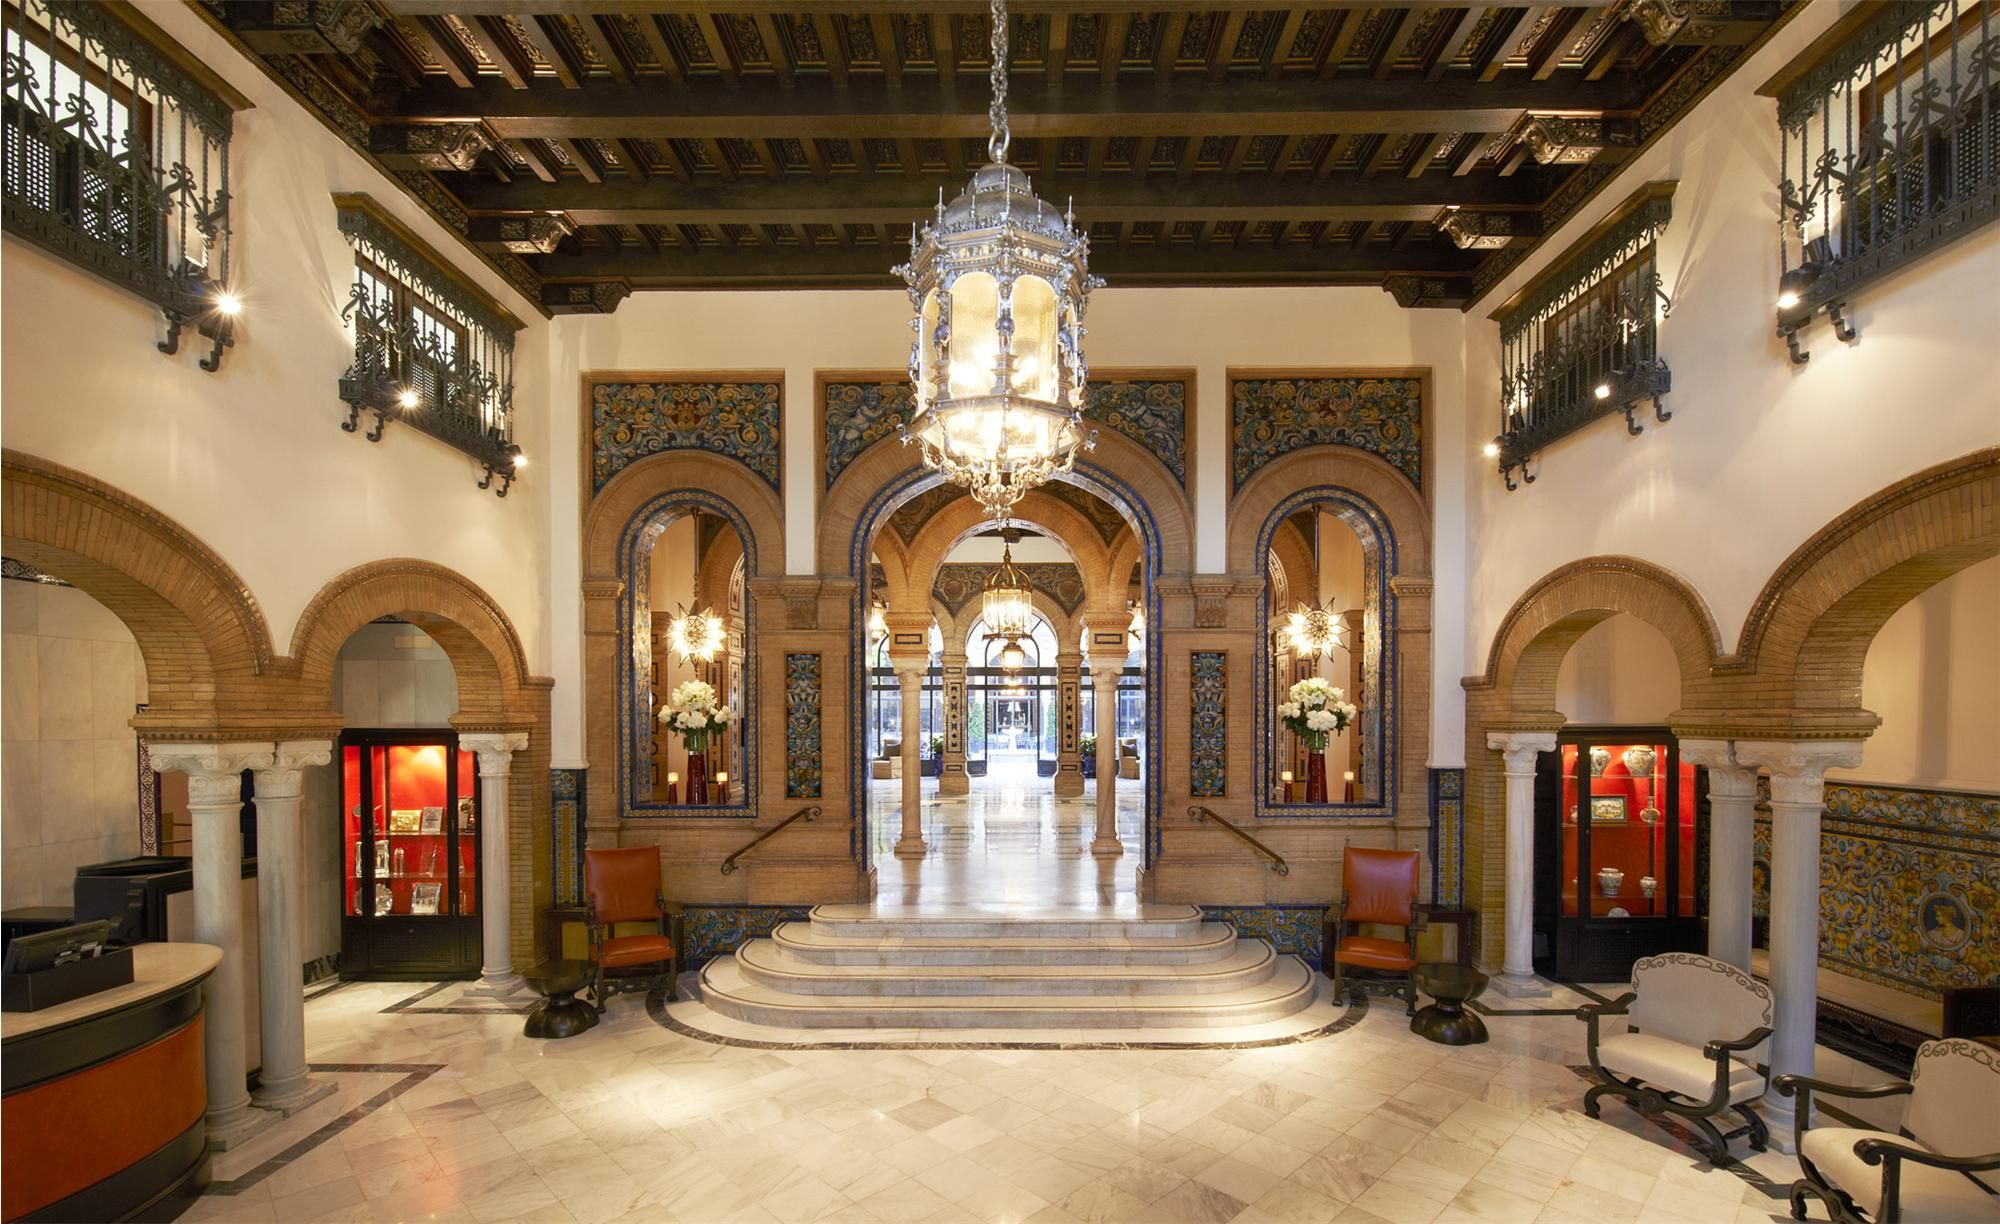 Hotel Alfonso XIII, Seville: Moorish influence, perfect location